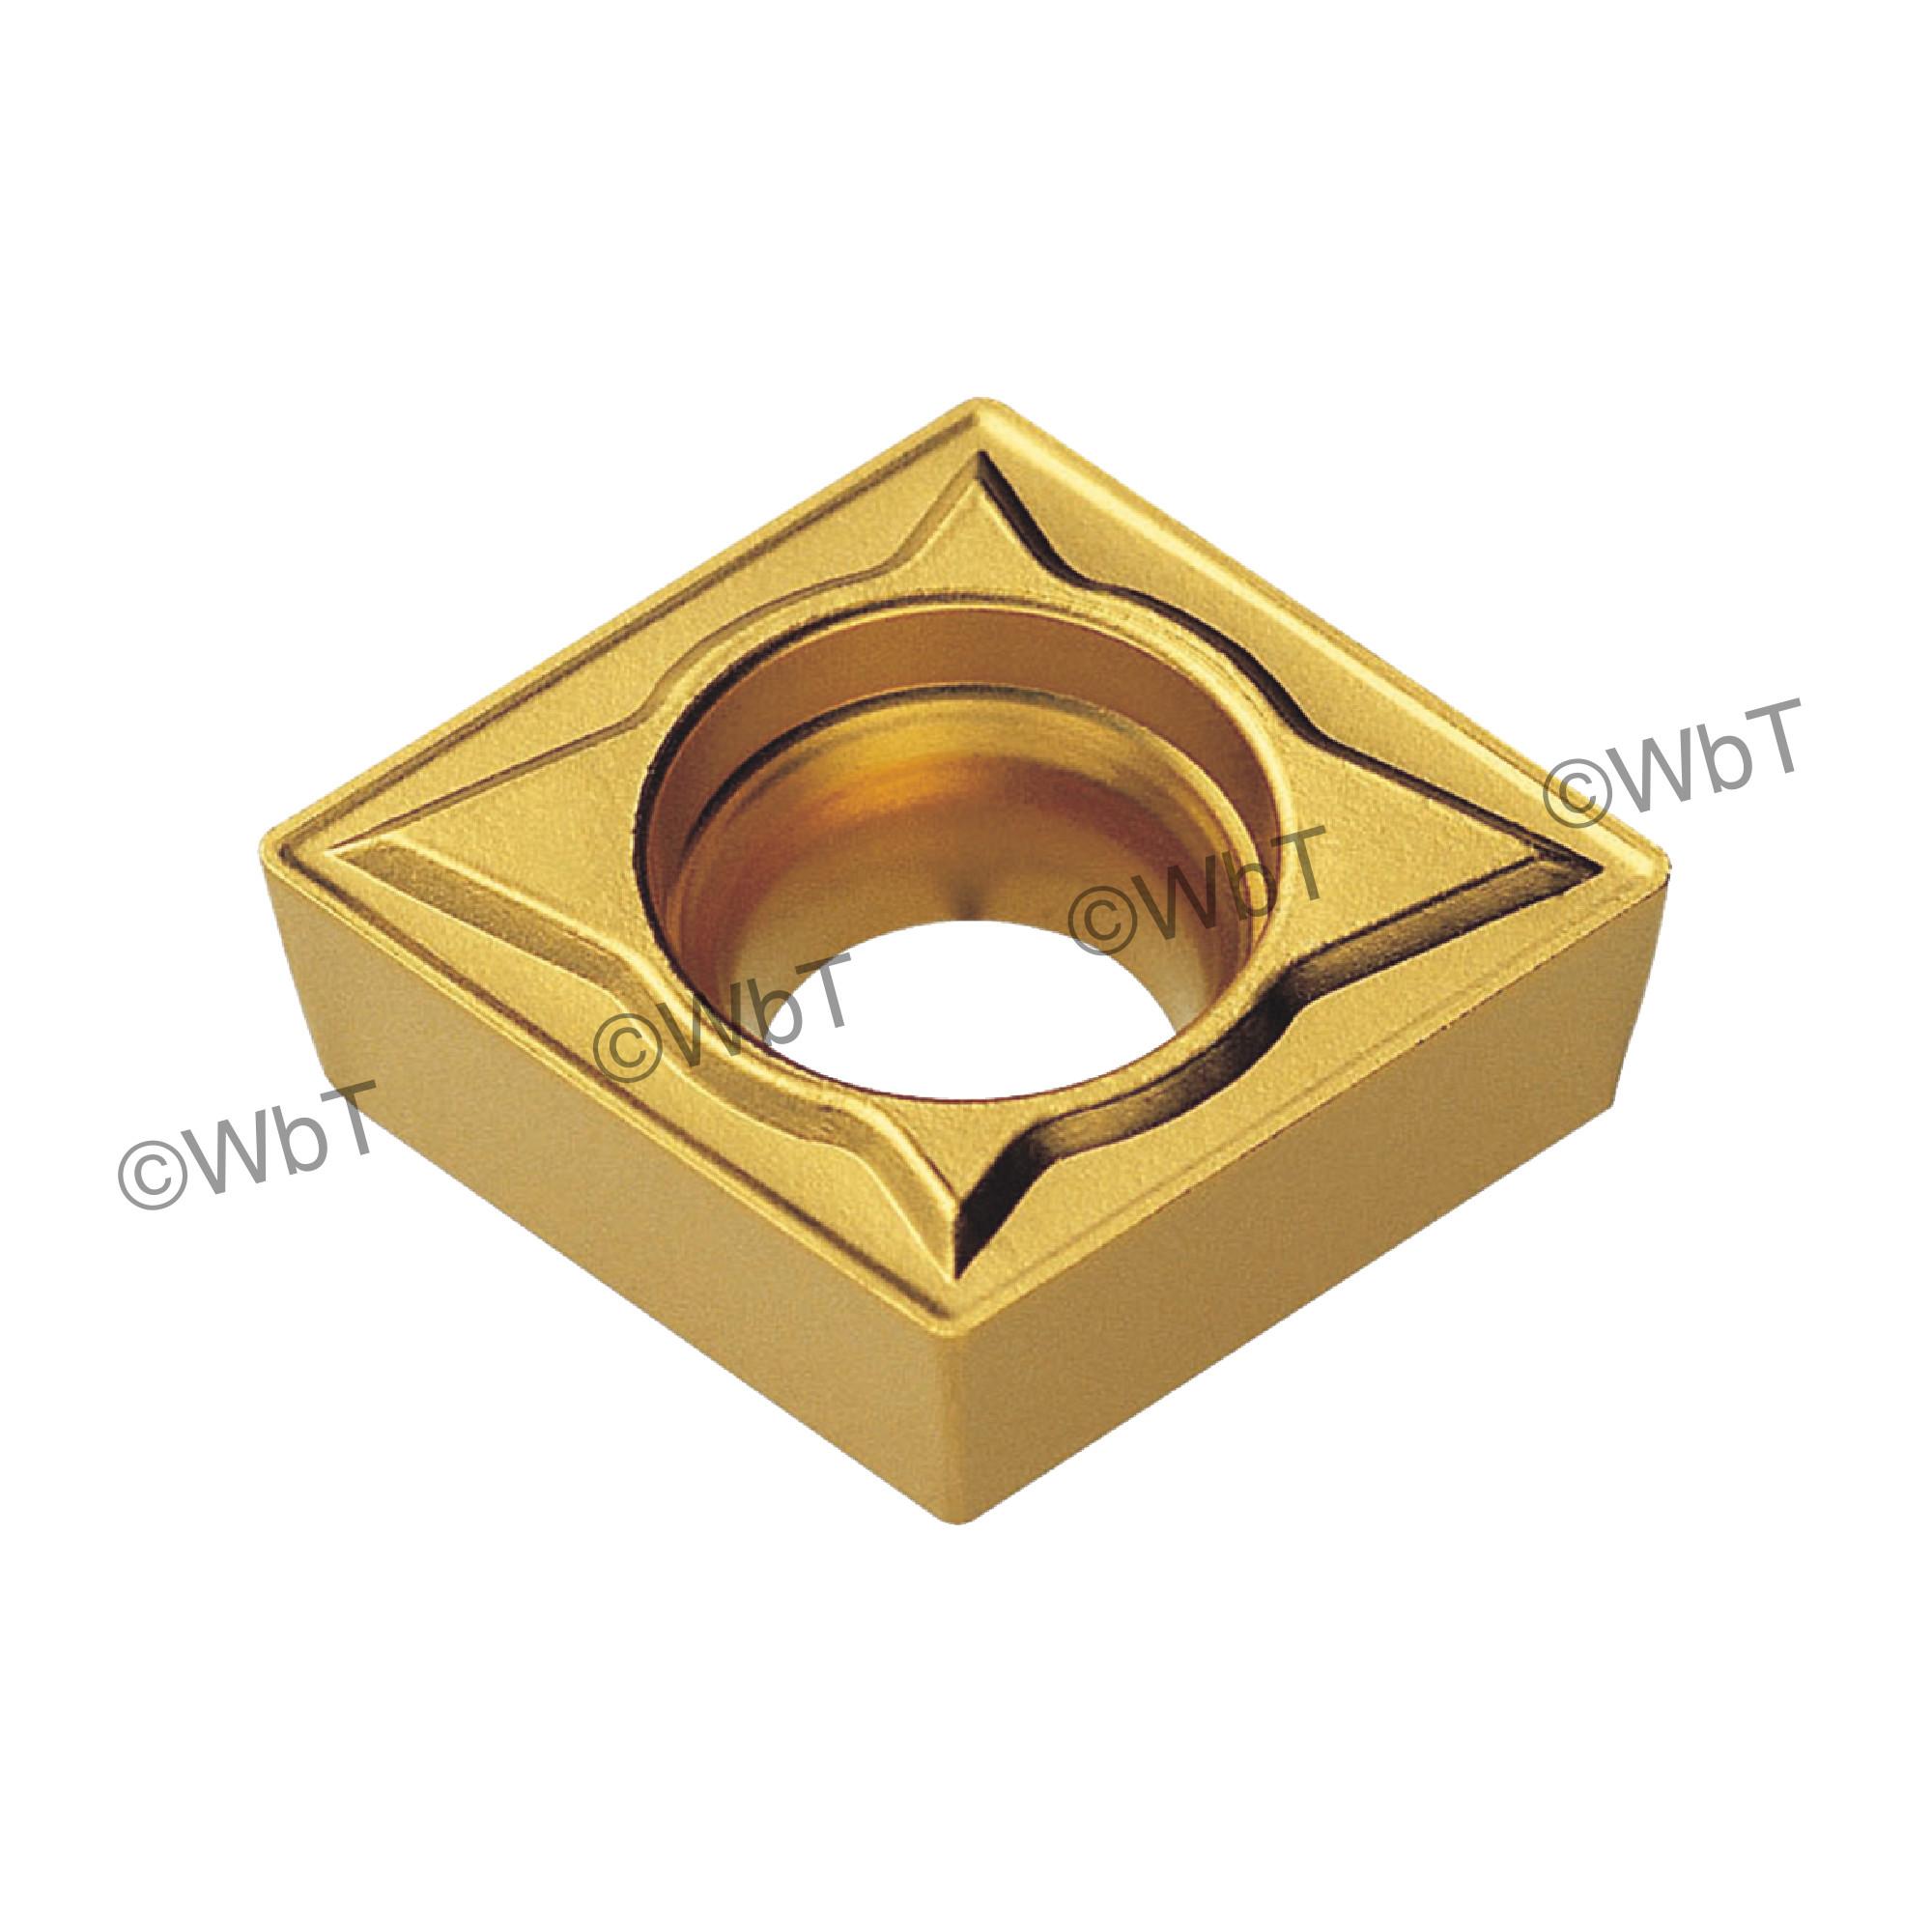 AKUMA - CCMT2(1.5)1-MP1 CT25M - 80° Diamond / Indexable Carbide Turning Insert